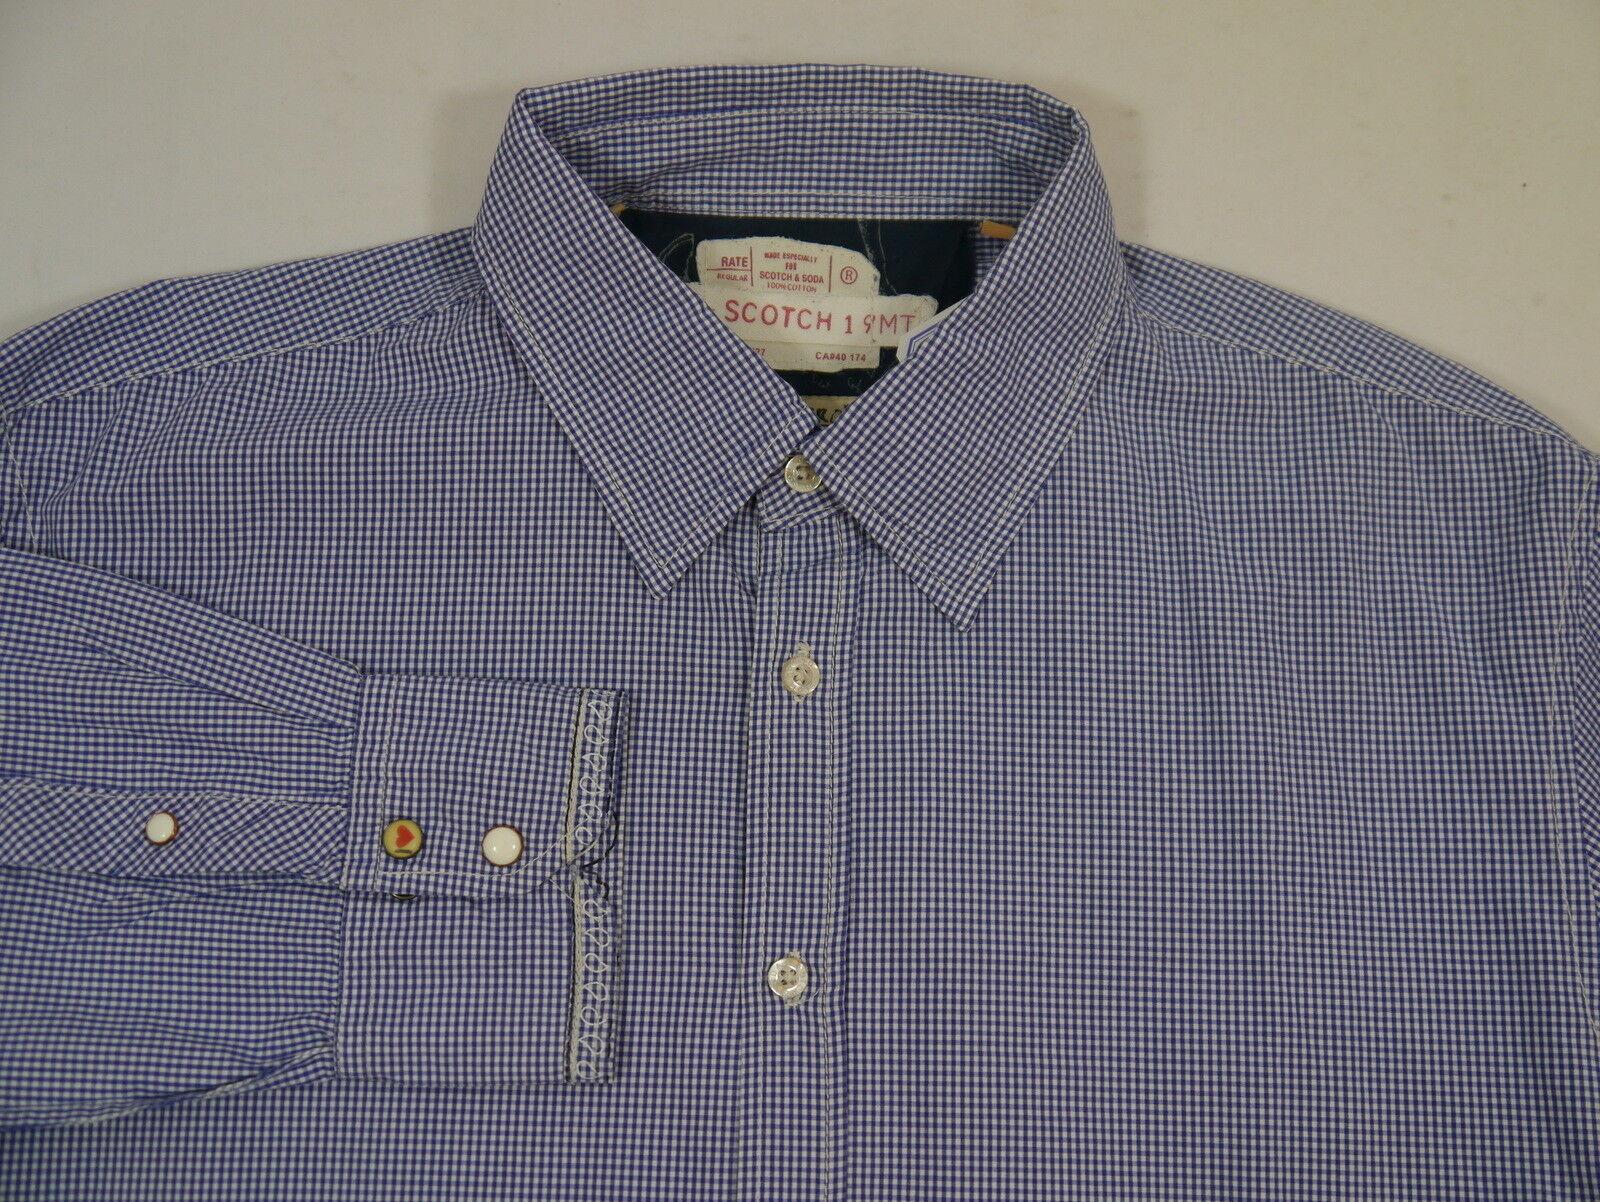 Herren Herren Herren Hemd blau-weiß kariert  Scotch & Soda Gr. XXL Regular Fit NEU   Mangelware  3c4046